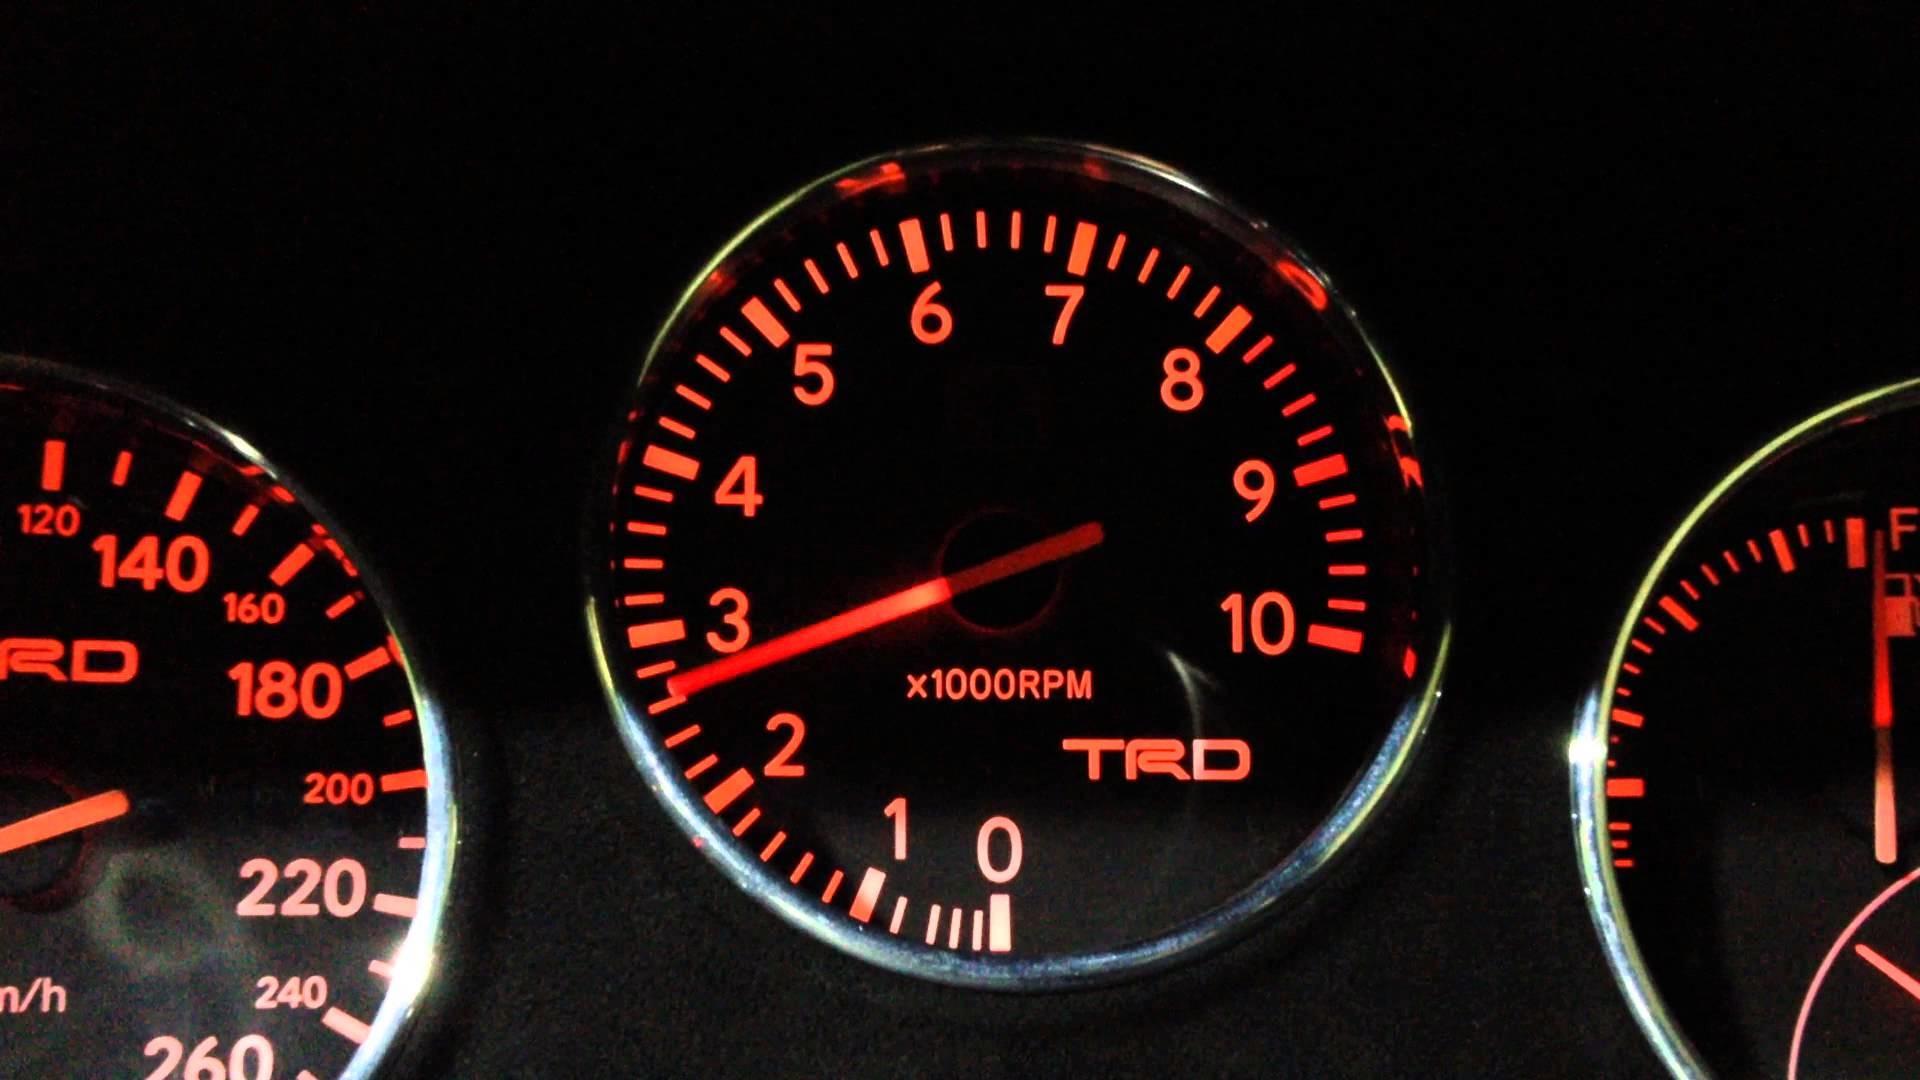 TRD Tachometer Toyota Supra 1994